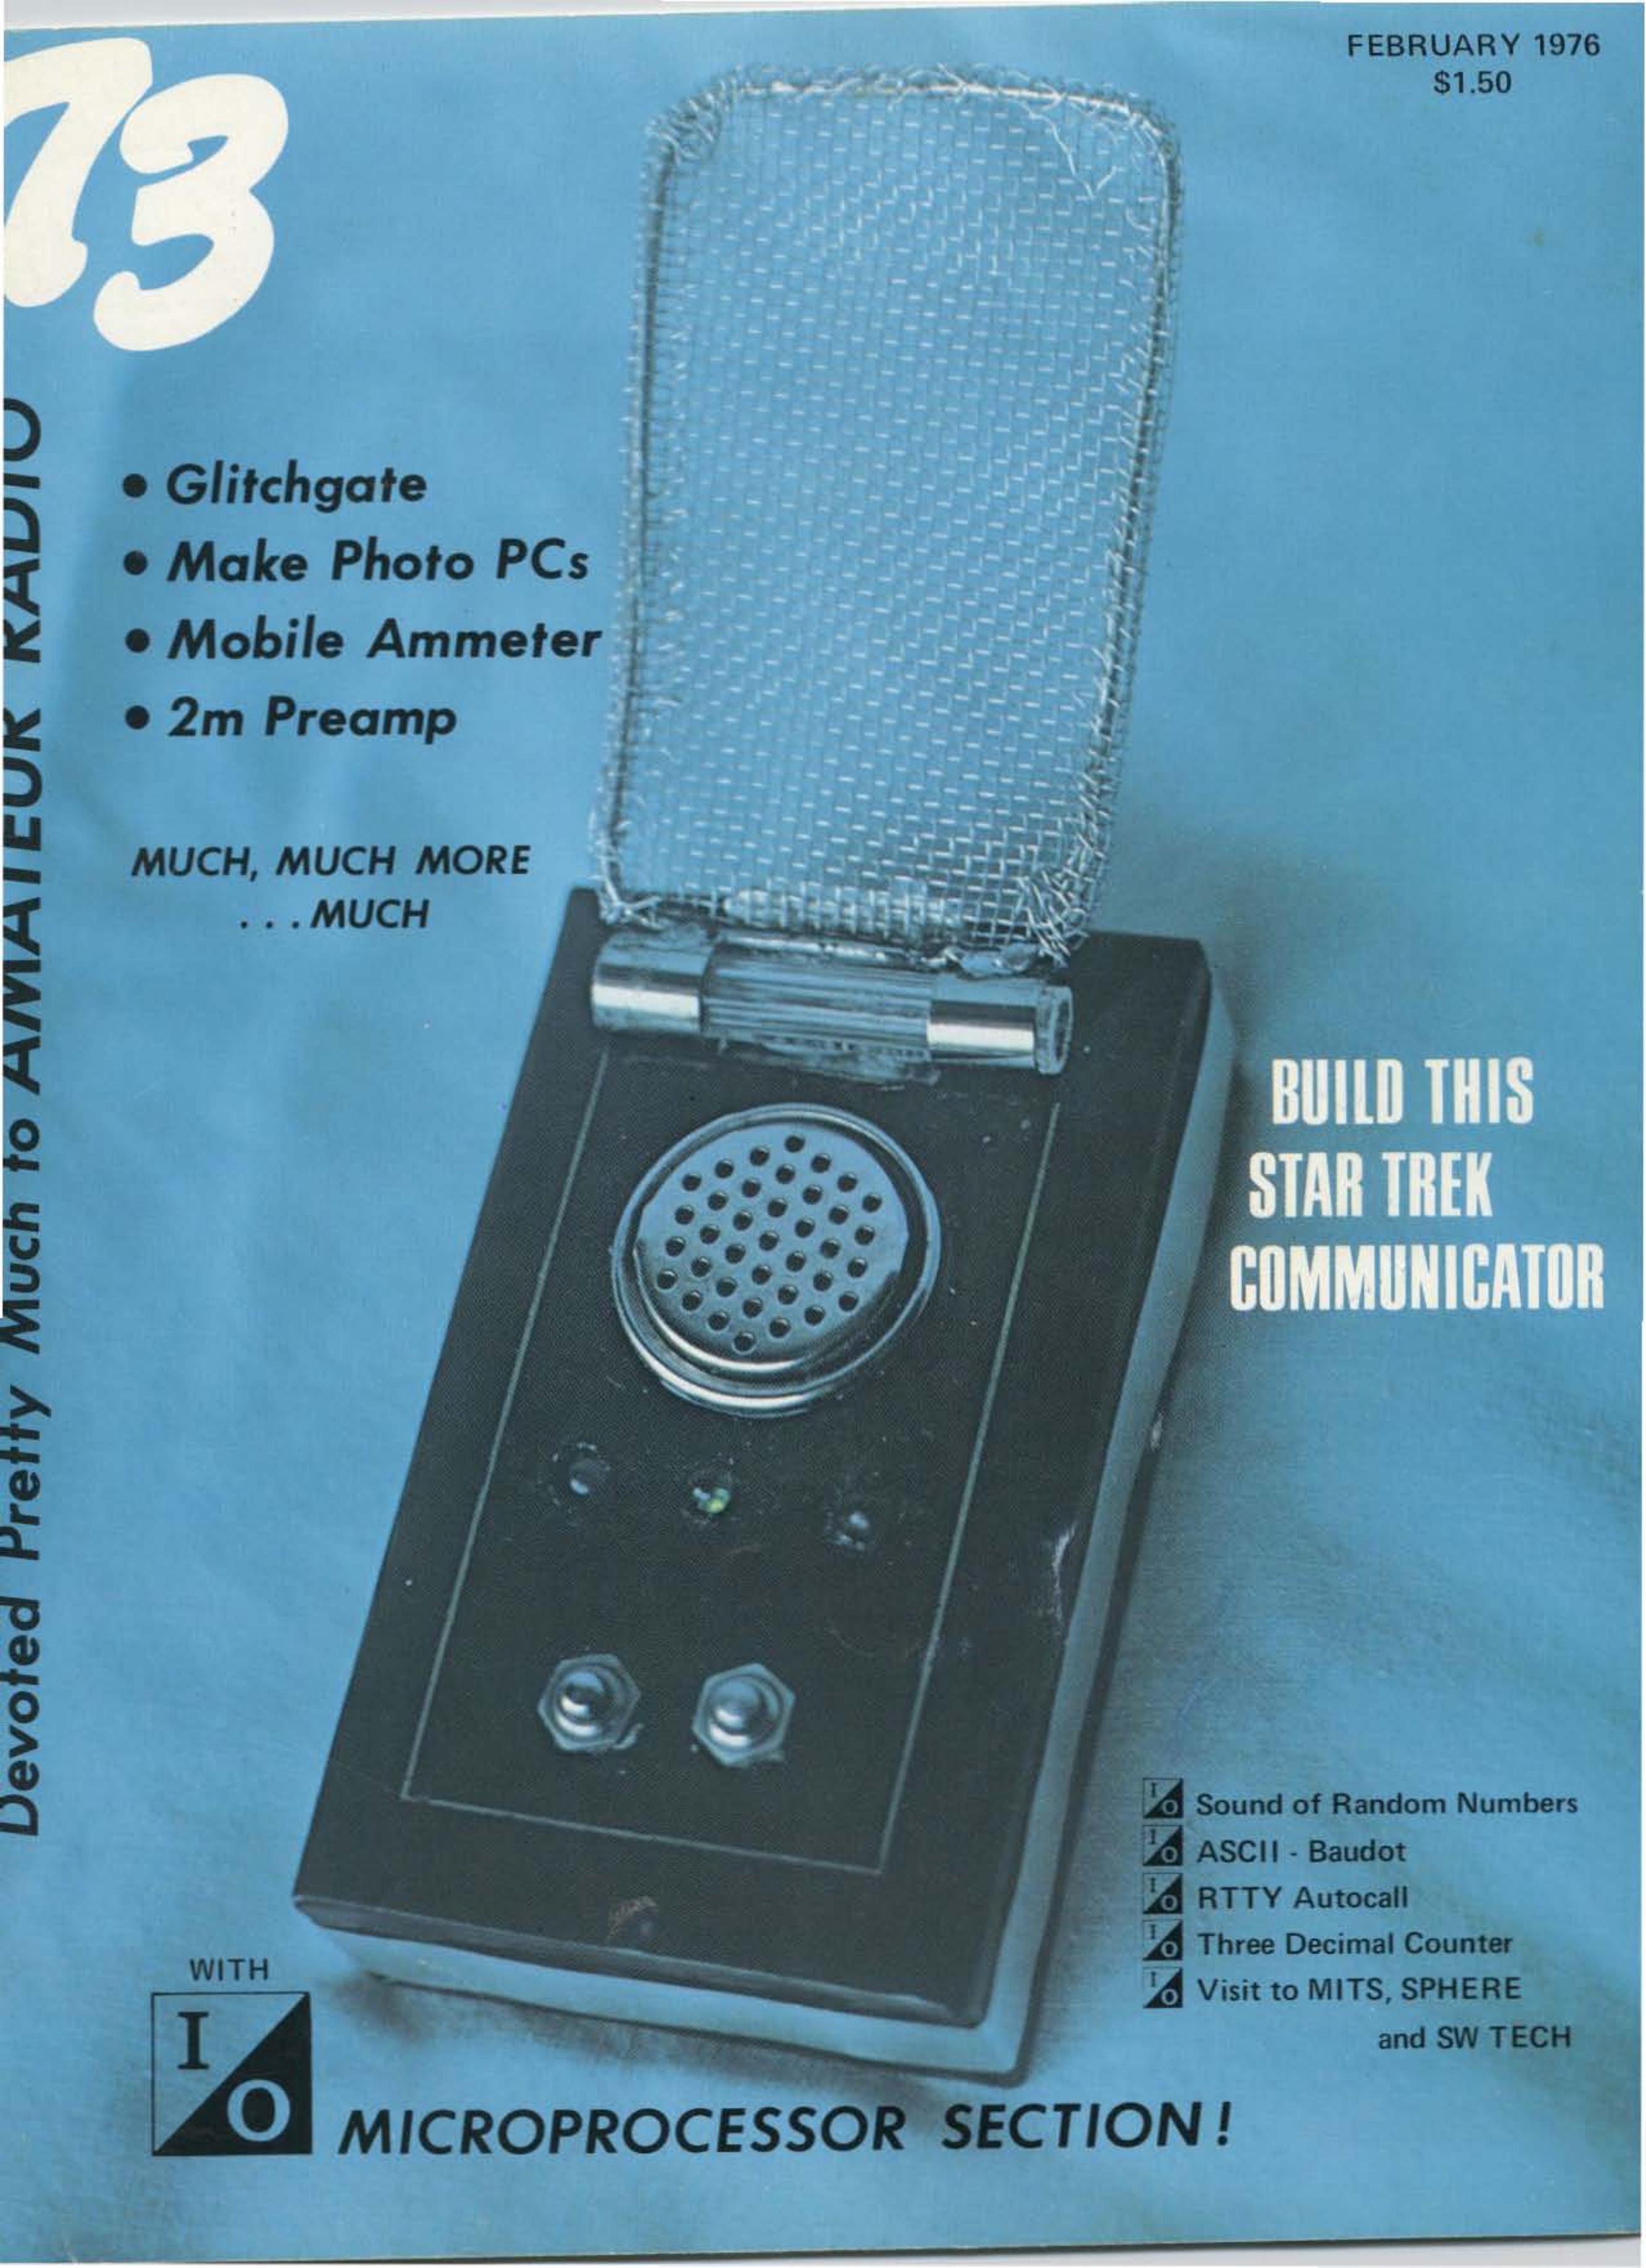 pdf for Owi Speaker IC6-730 manual